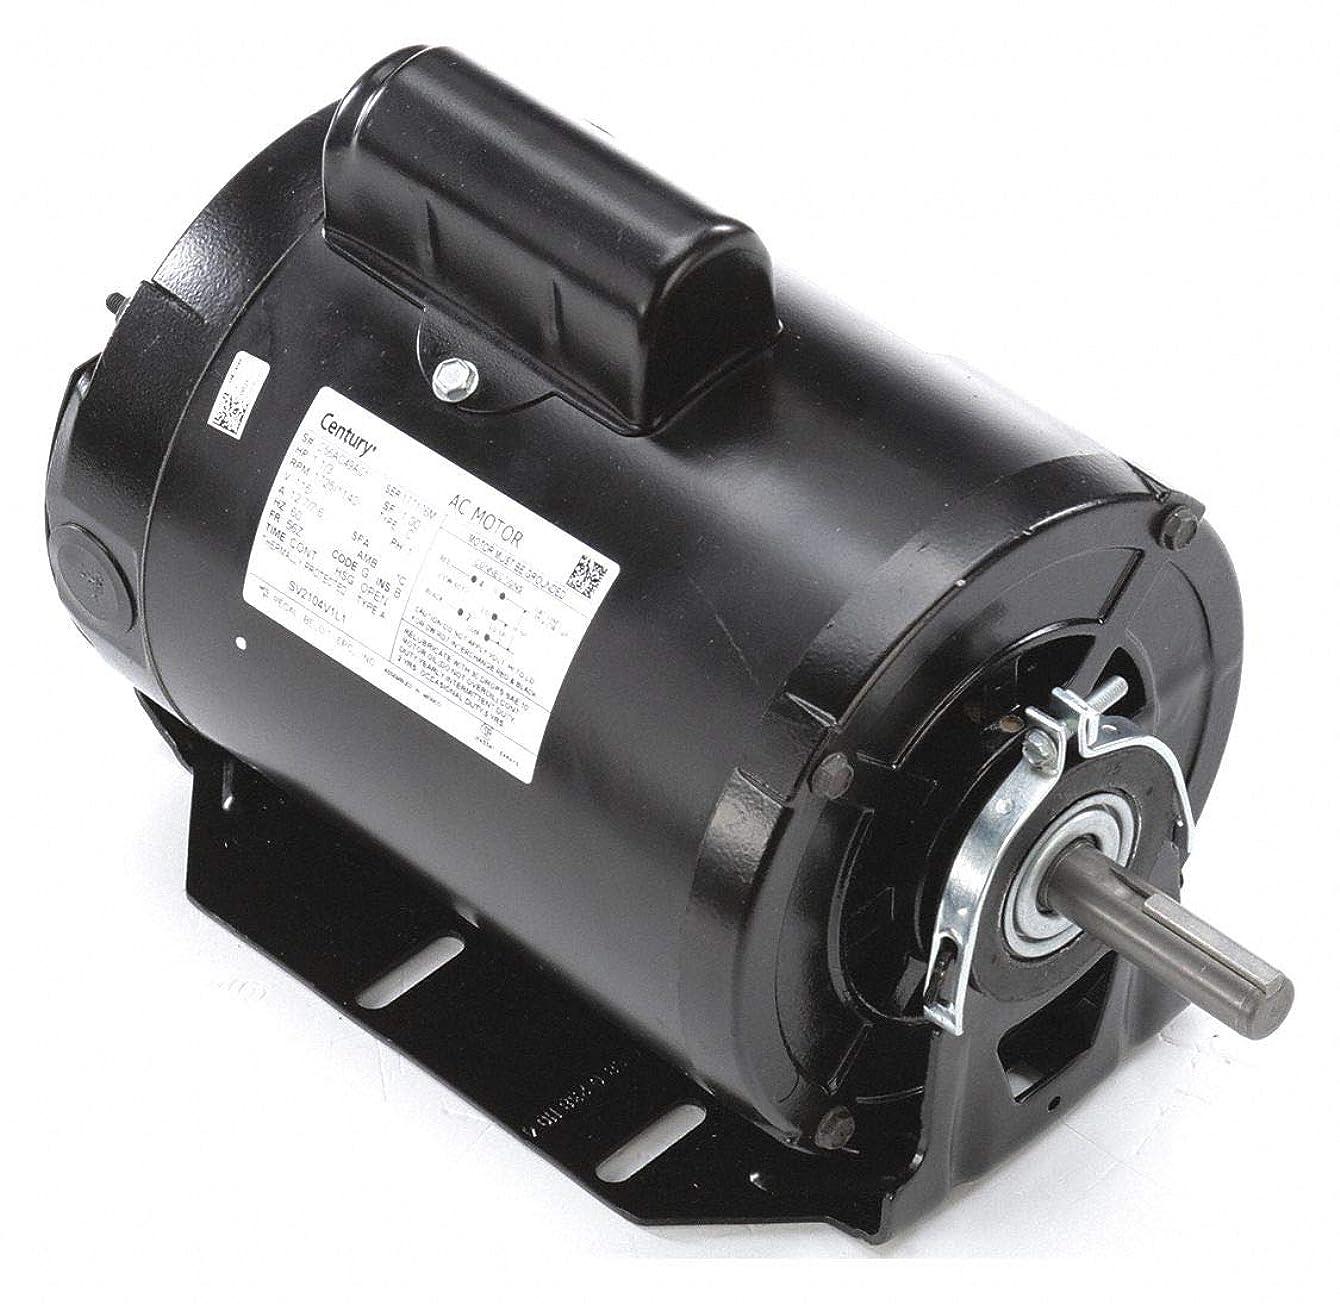 Evap Cooler Motor, 1 HP, 115V, 2 Speed